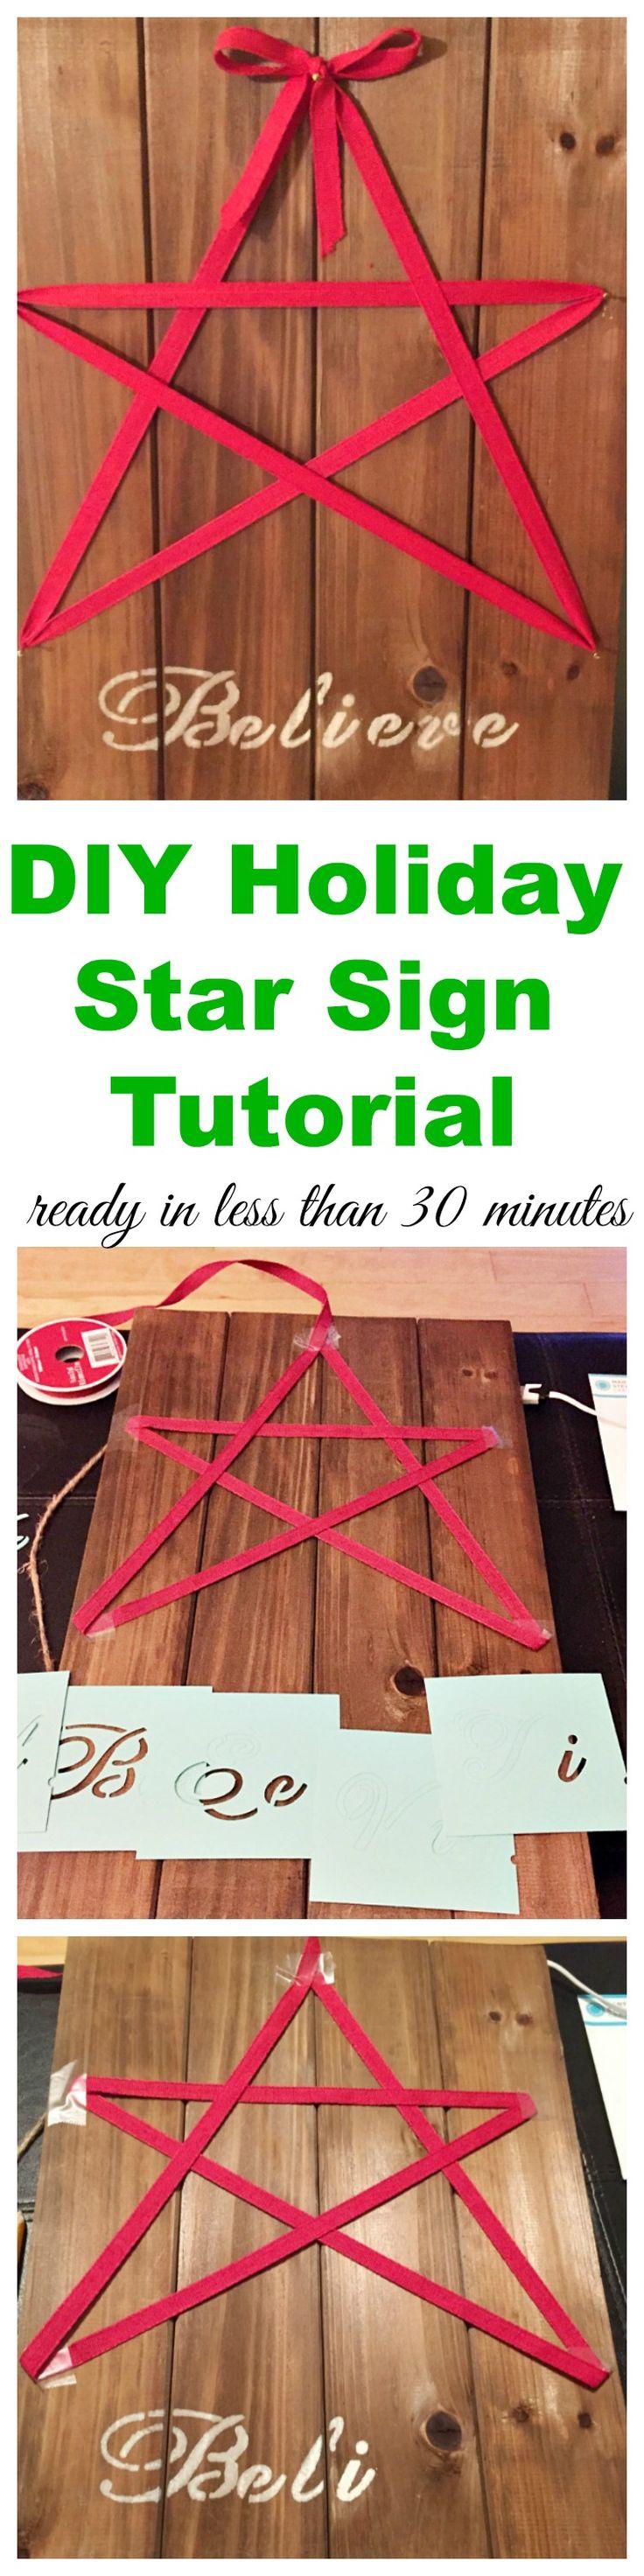 Easy Diy Holiday Star Sign Tutorial Christmas Decor And